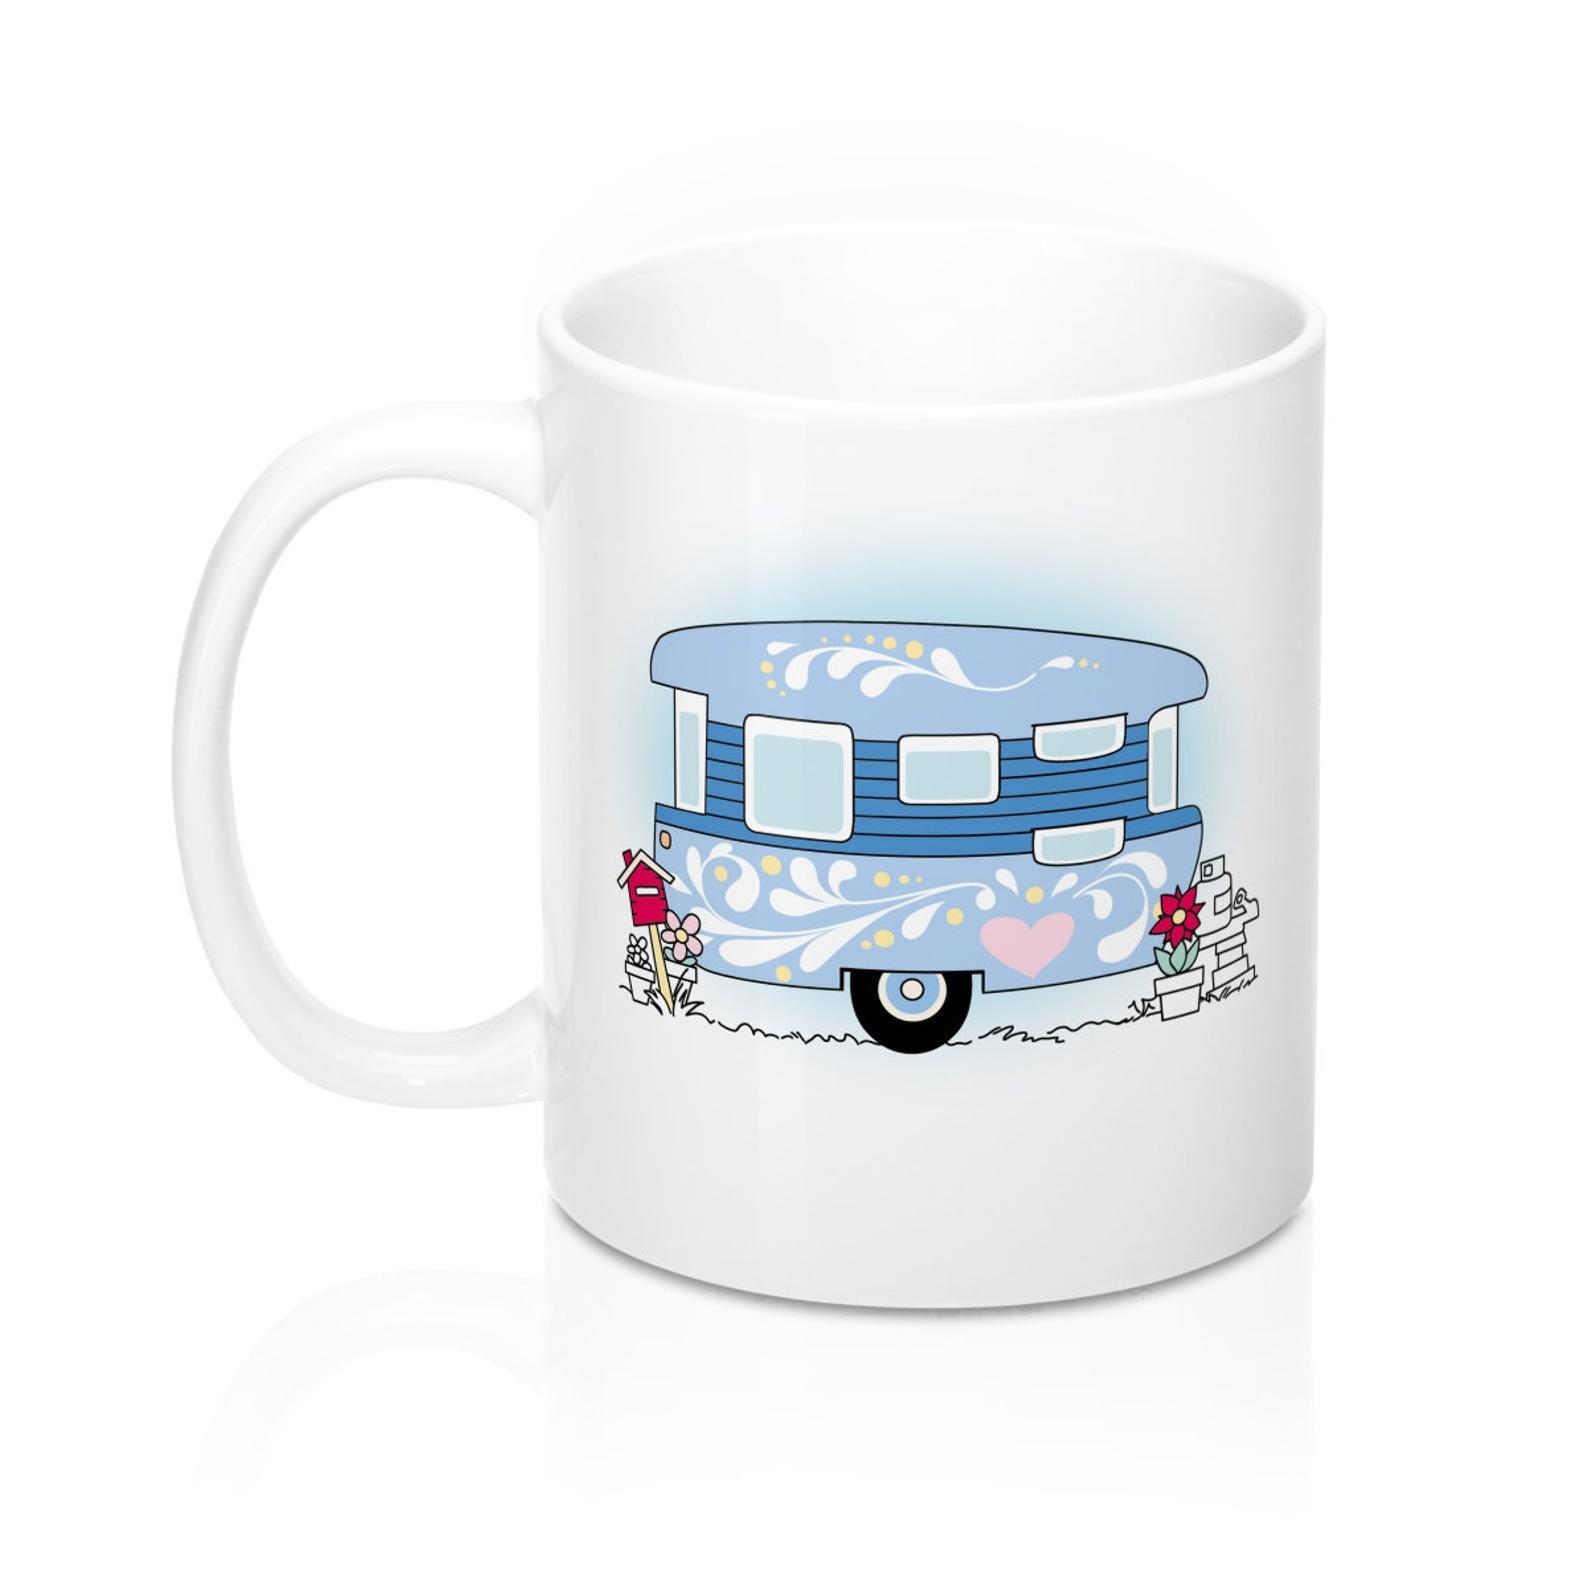 Christmas Camper Mug Christmas Mug Purple Camper Caravan Mug Happy Glamper Mug Rv Mug Mugs Christmas Mugs Ceramic Coffee Cups